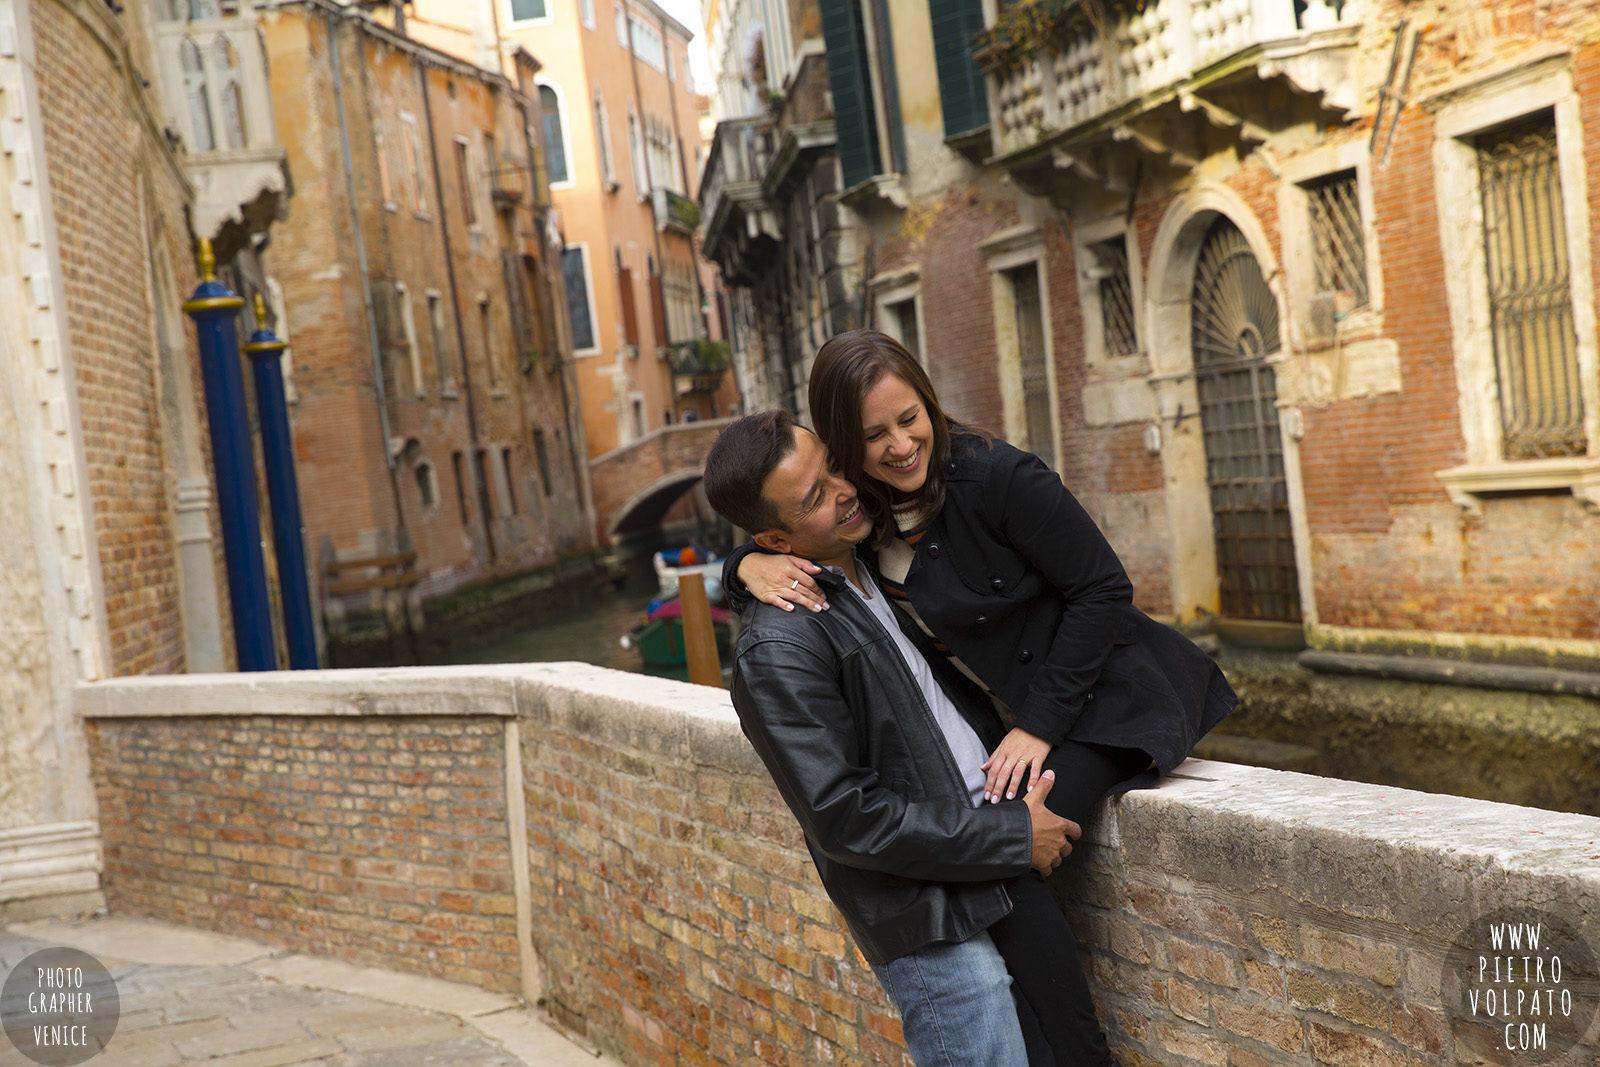 photographer-venice-honeymoon-couple-romantic-vacation-pictures-20170309_04